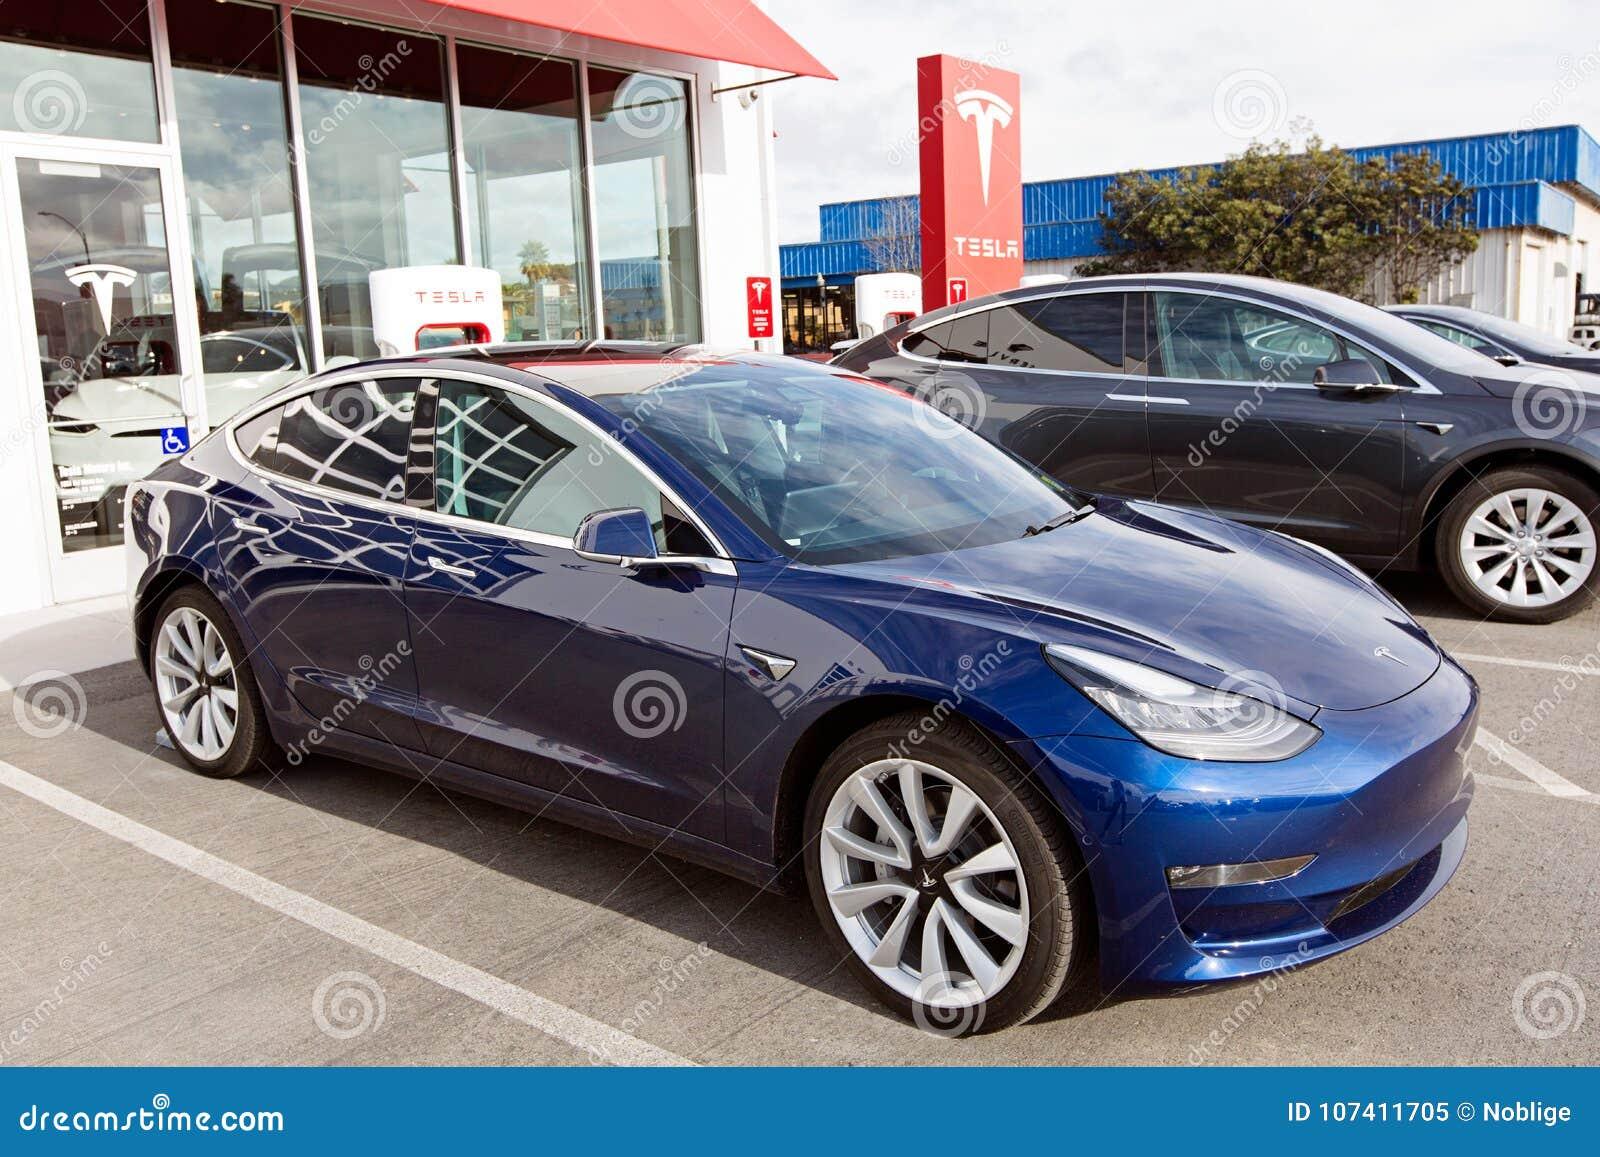 Tesla Model 3 New Electric Car Editorial Image - Image of